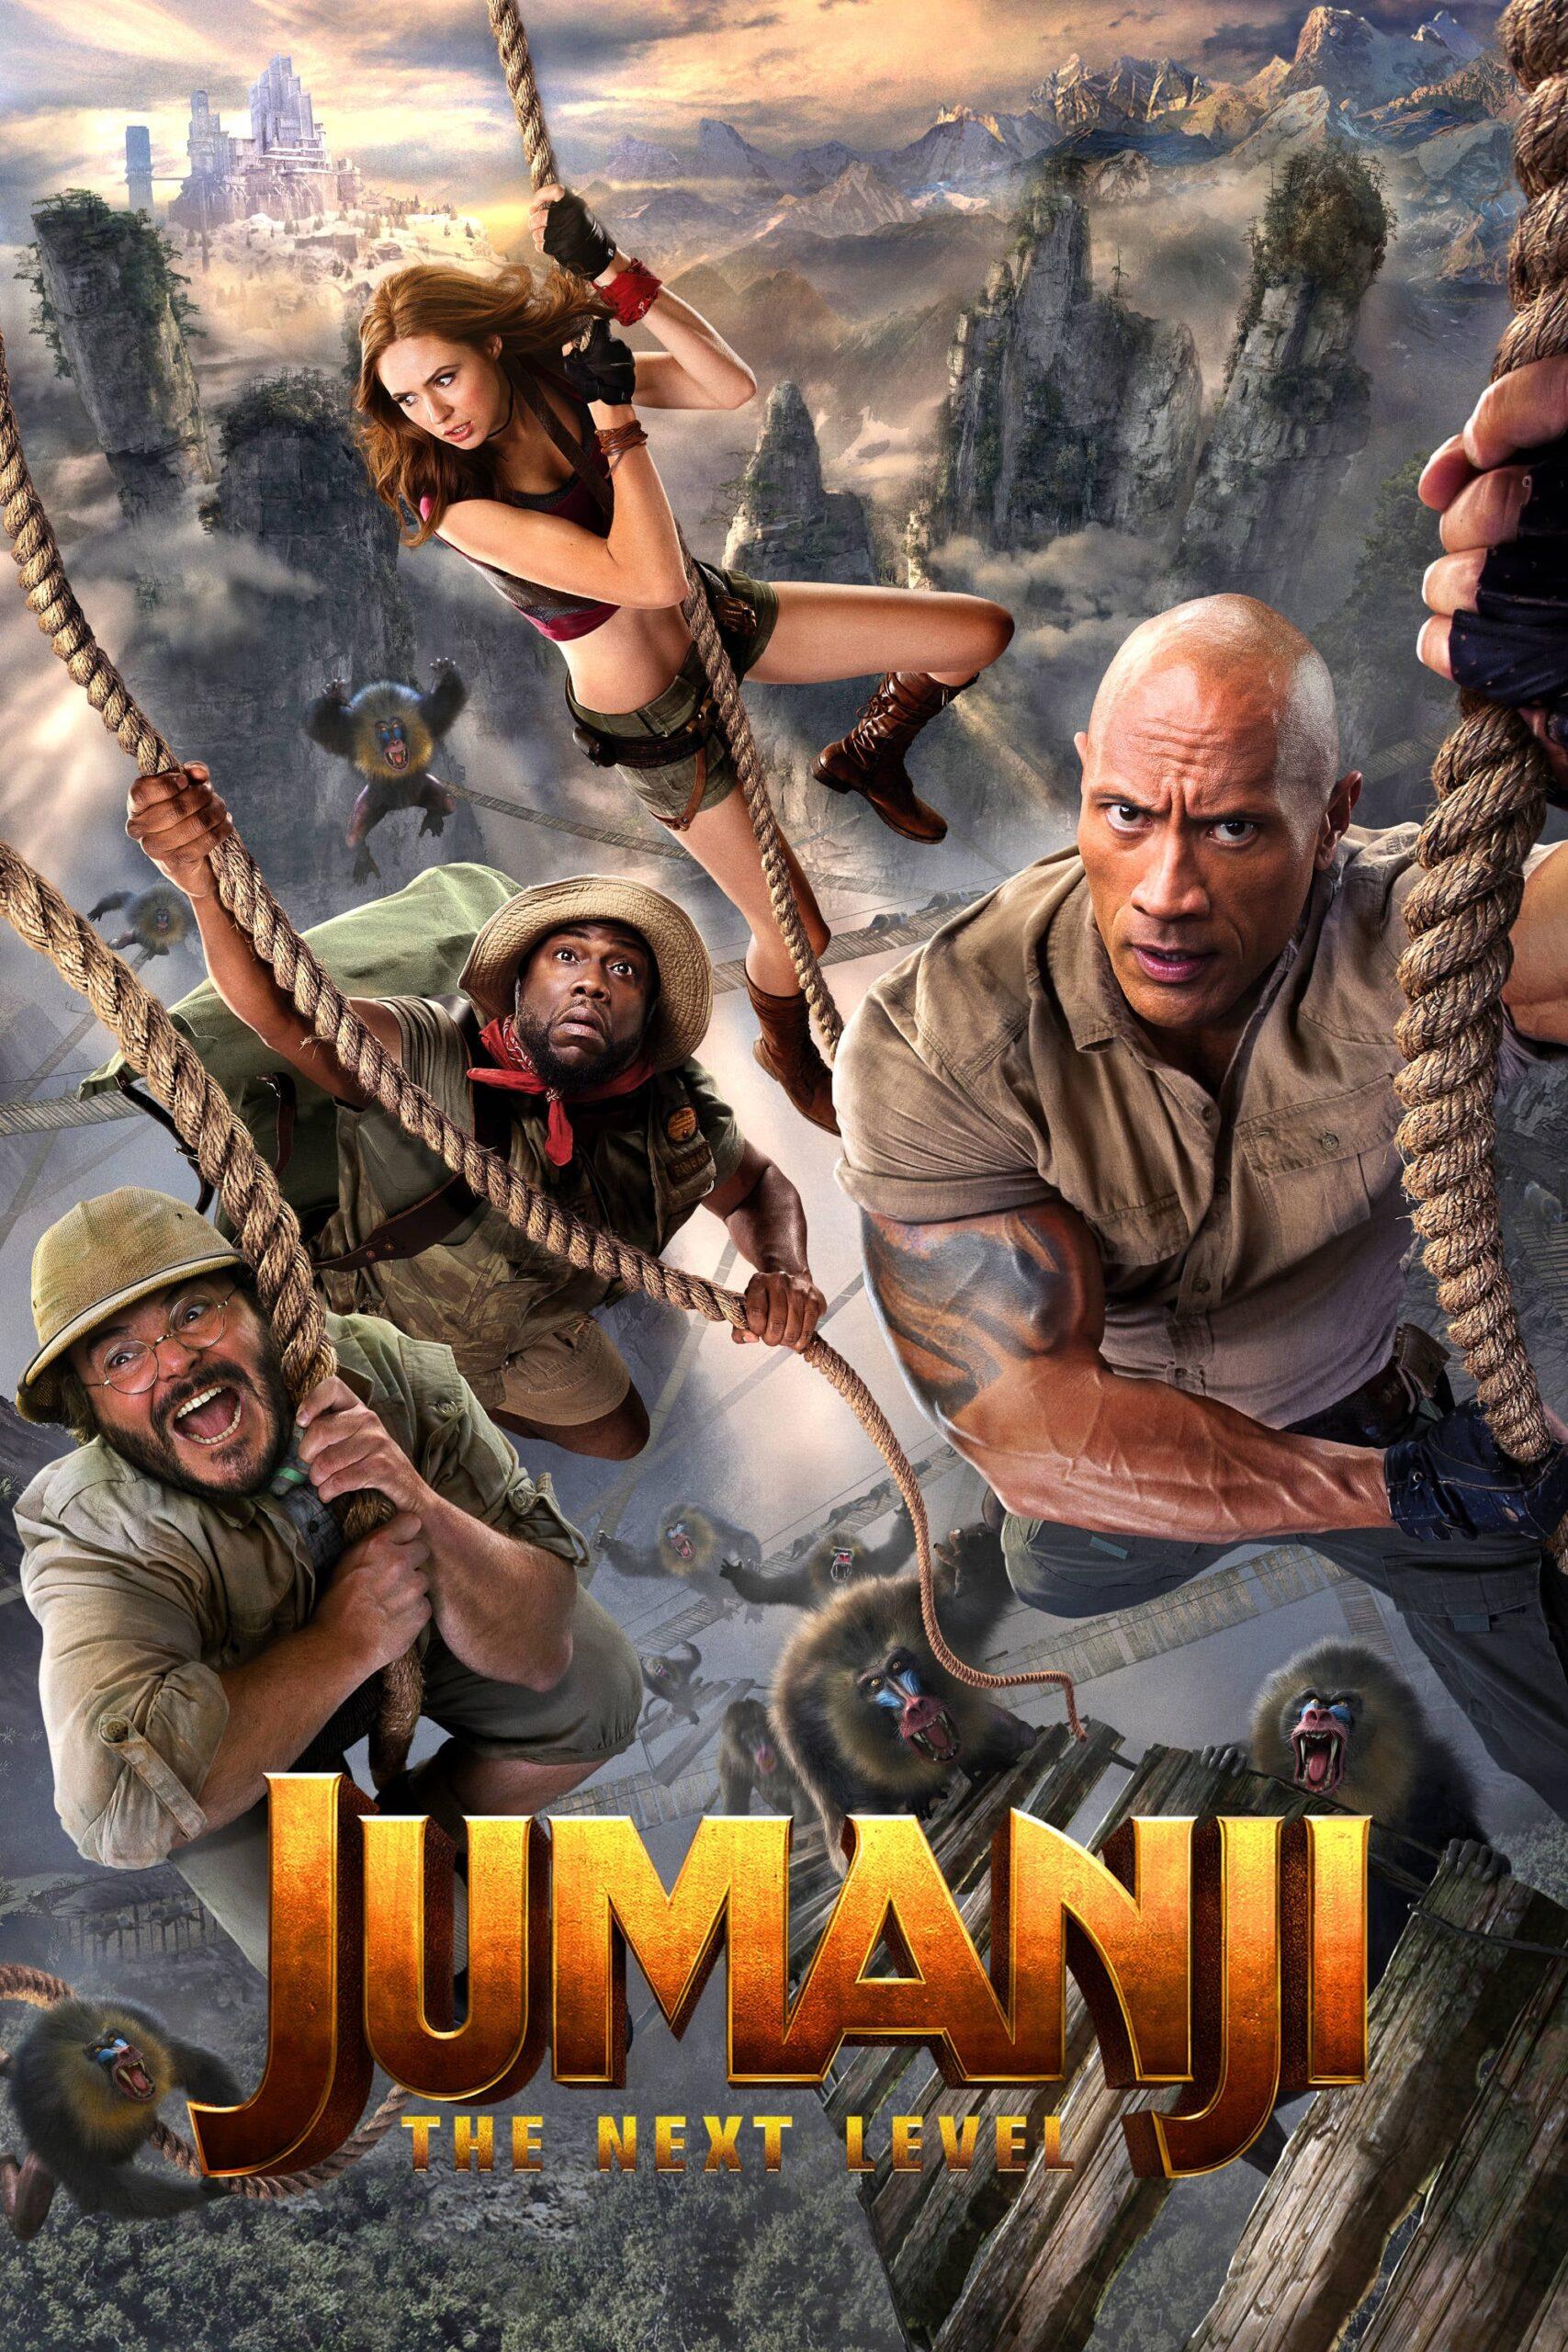 Jumanji: The Next Level Movie Streaming Online Watch on Amazon, Google Play, Youtube, iTunes